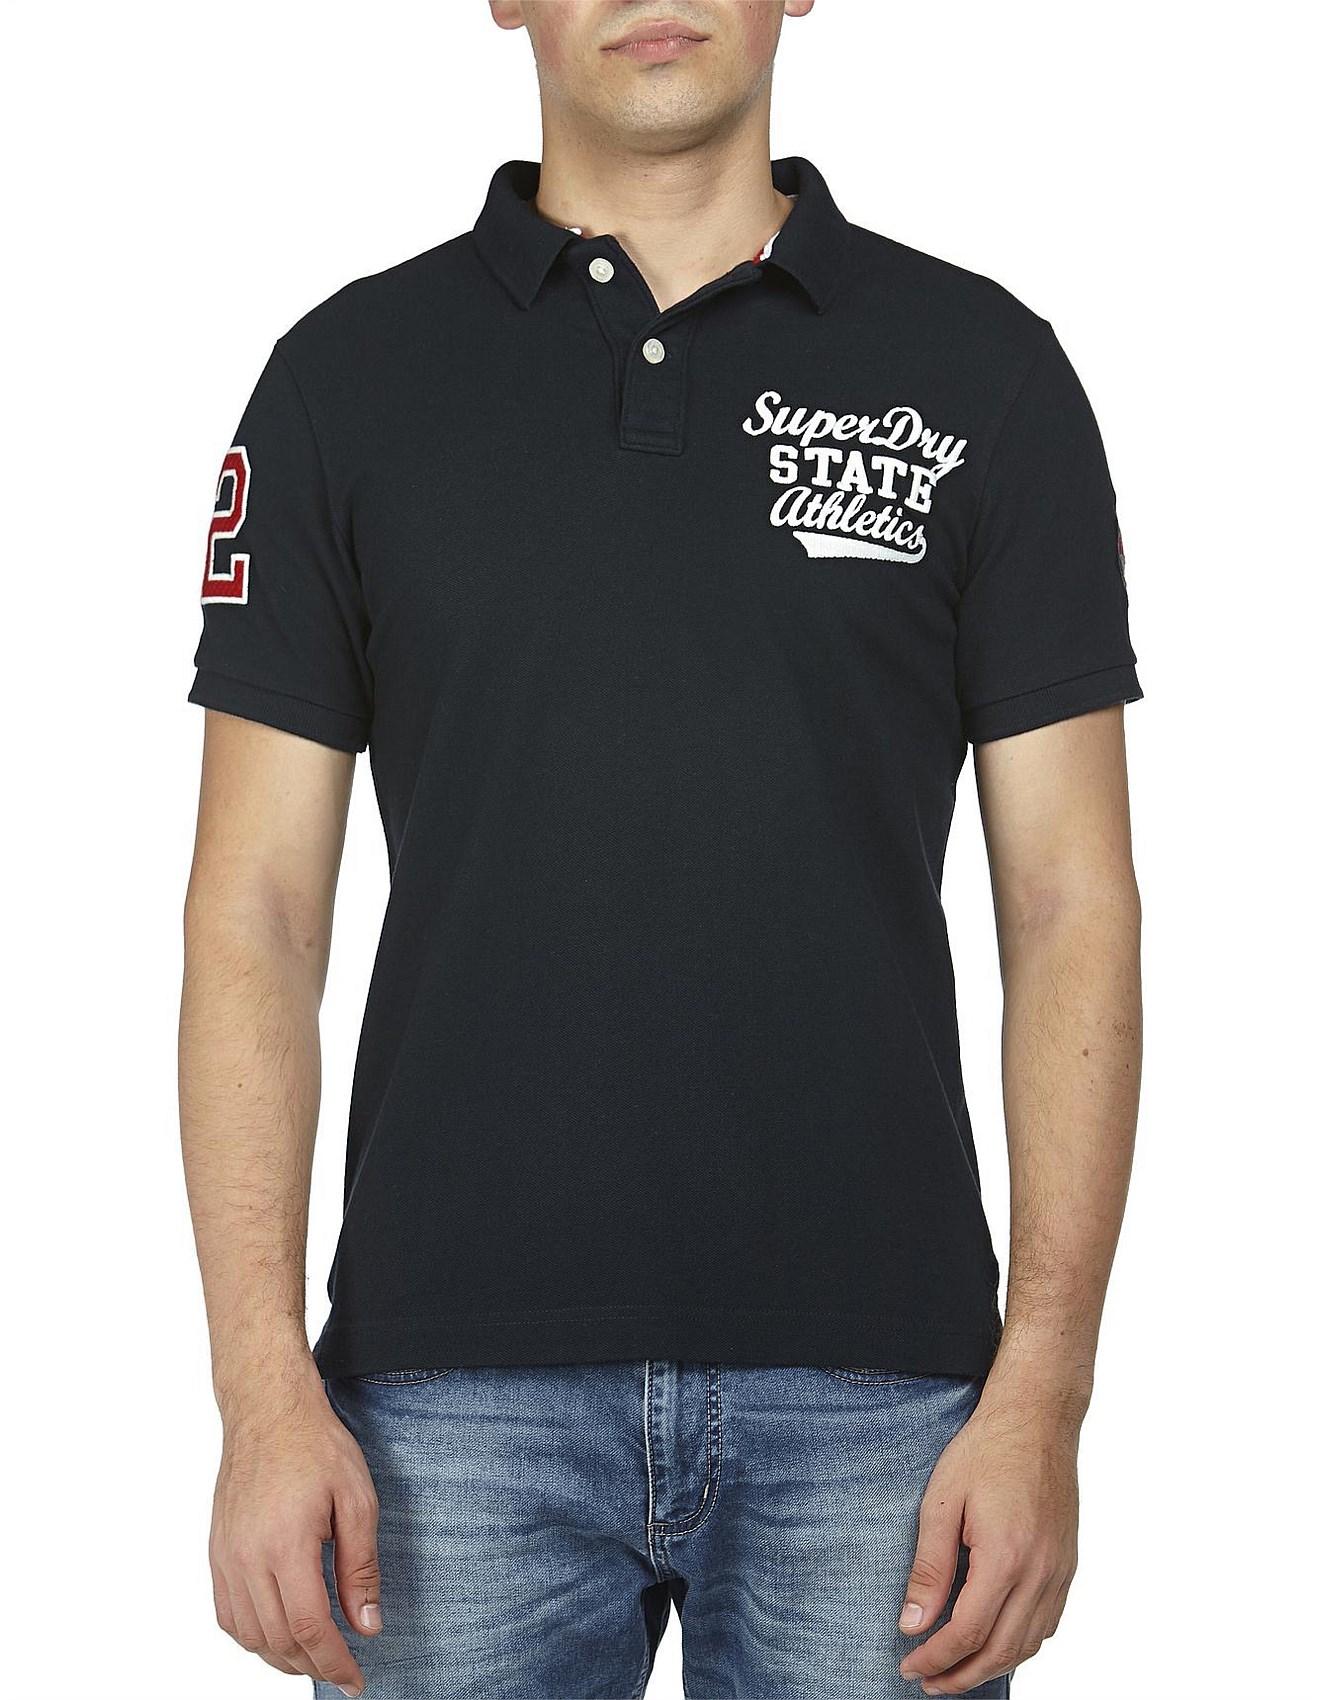 fc9bf6288912 Online Jones Superdry Jackets Buy Clothing David amp  61qR1xI